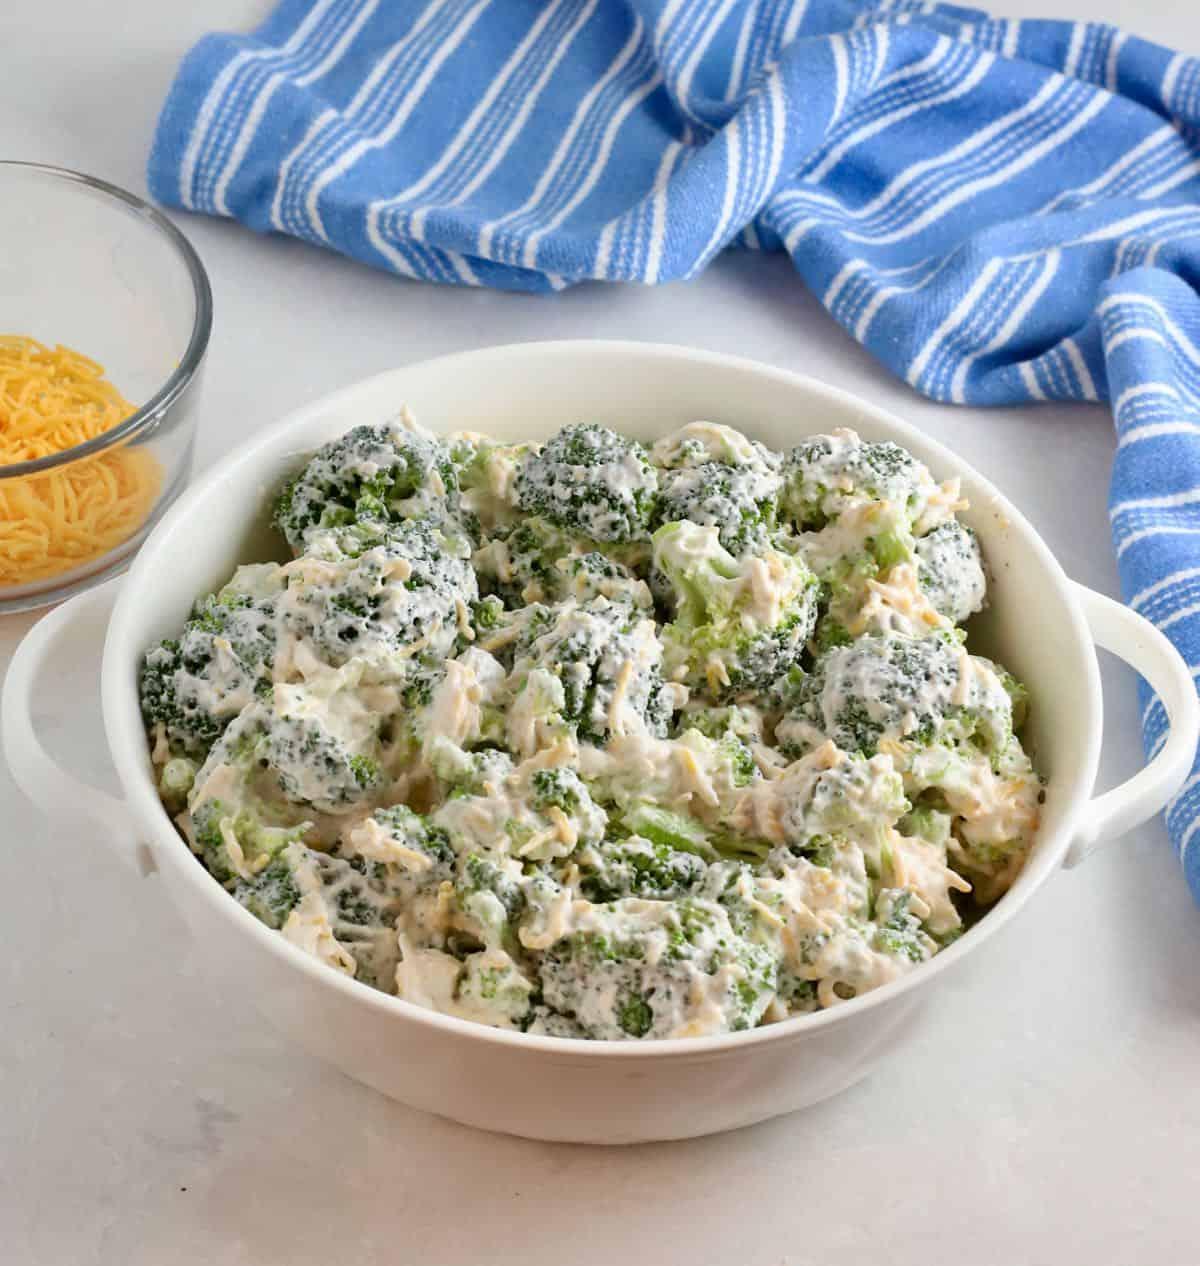 A white baking dish full of broccoli casserole.